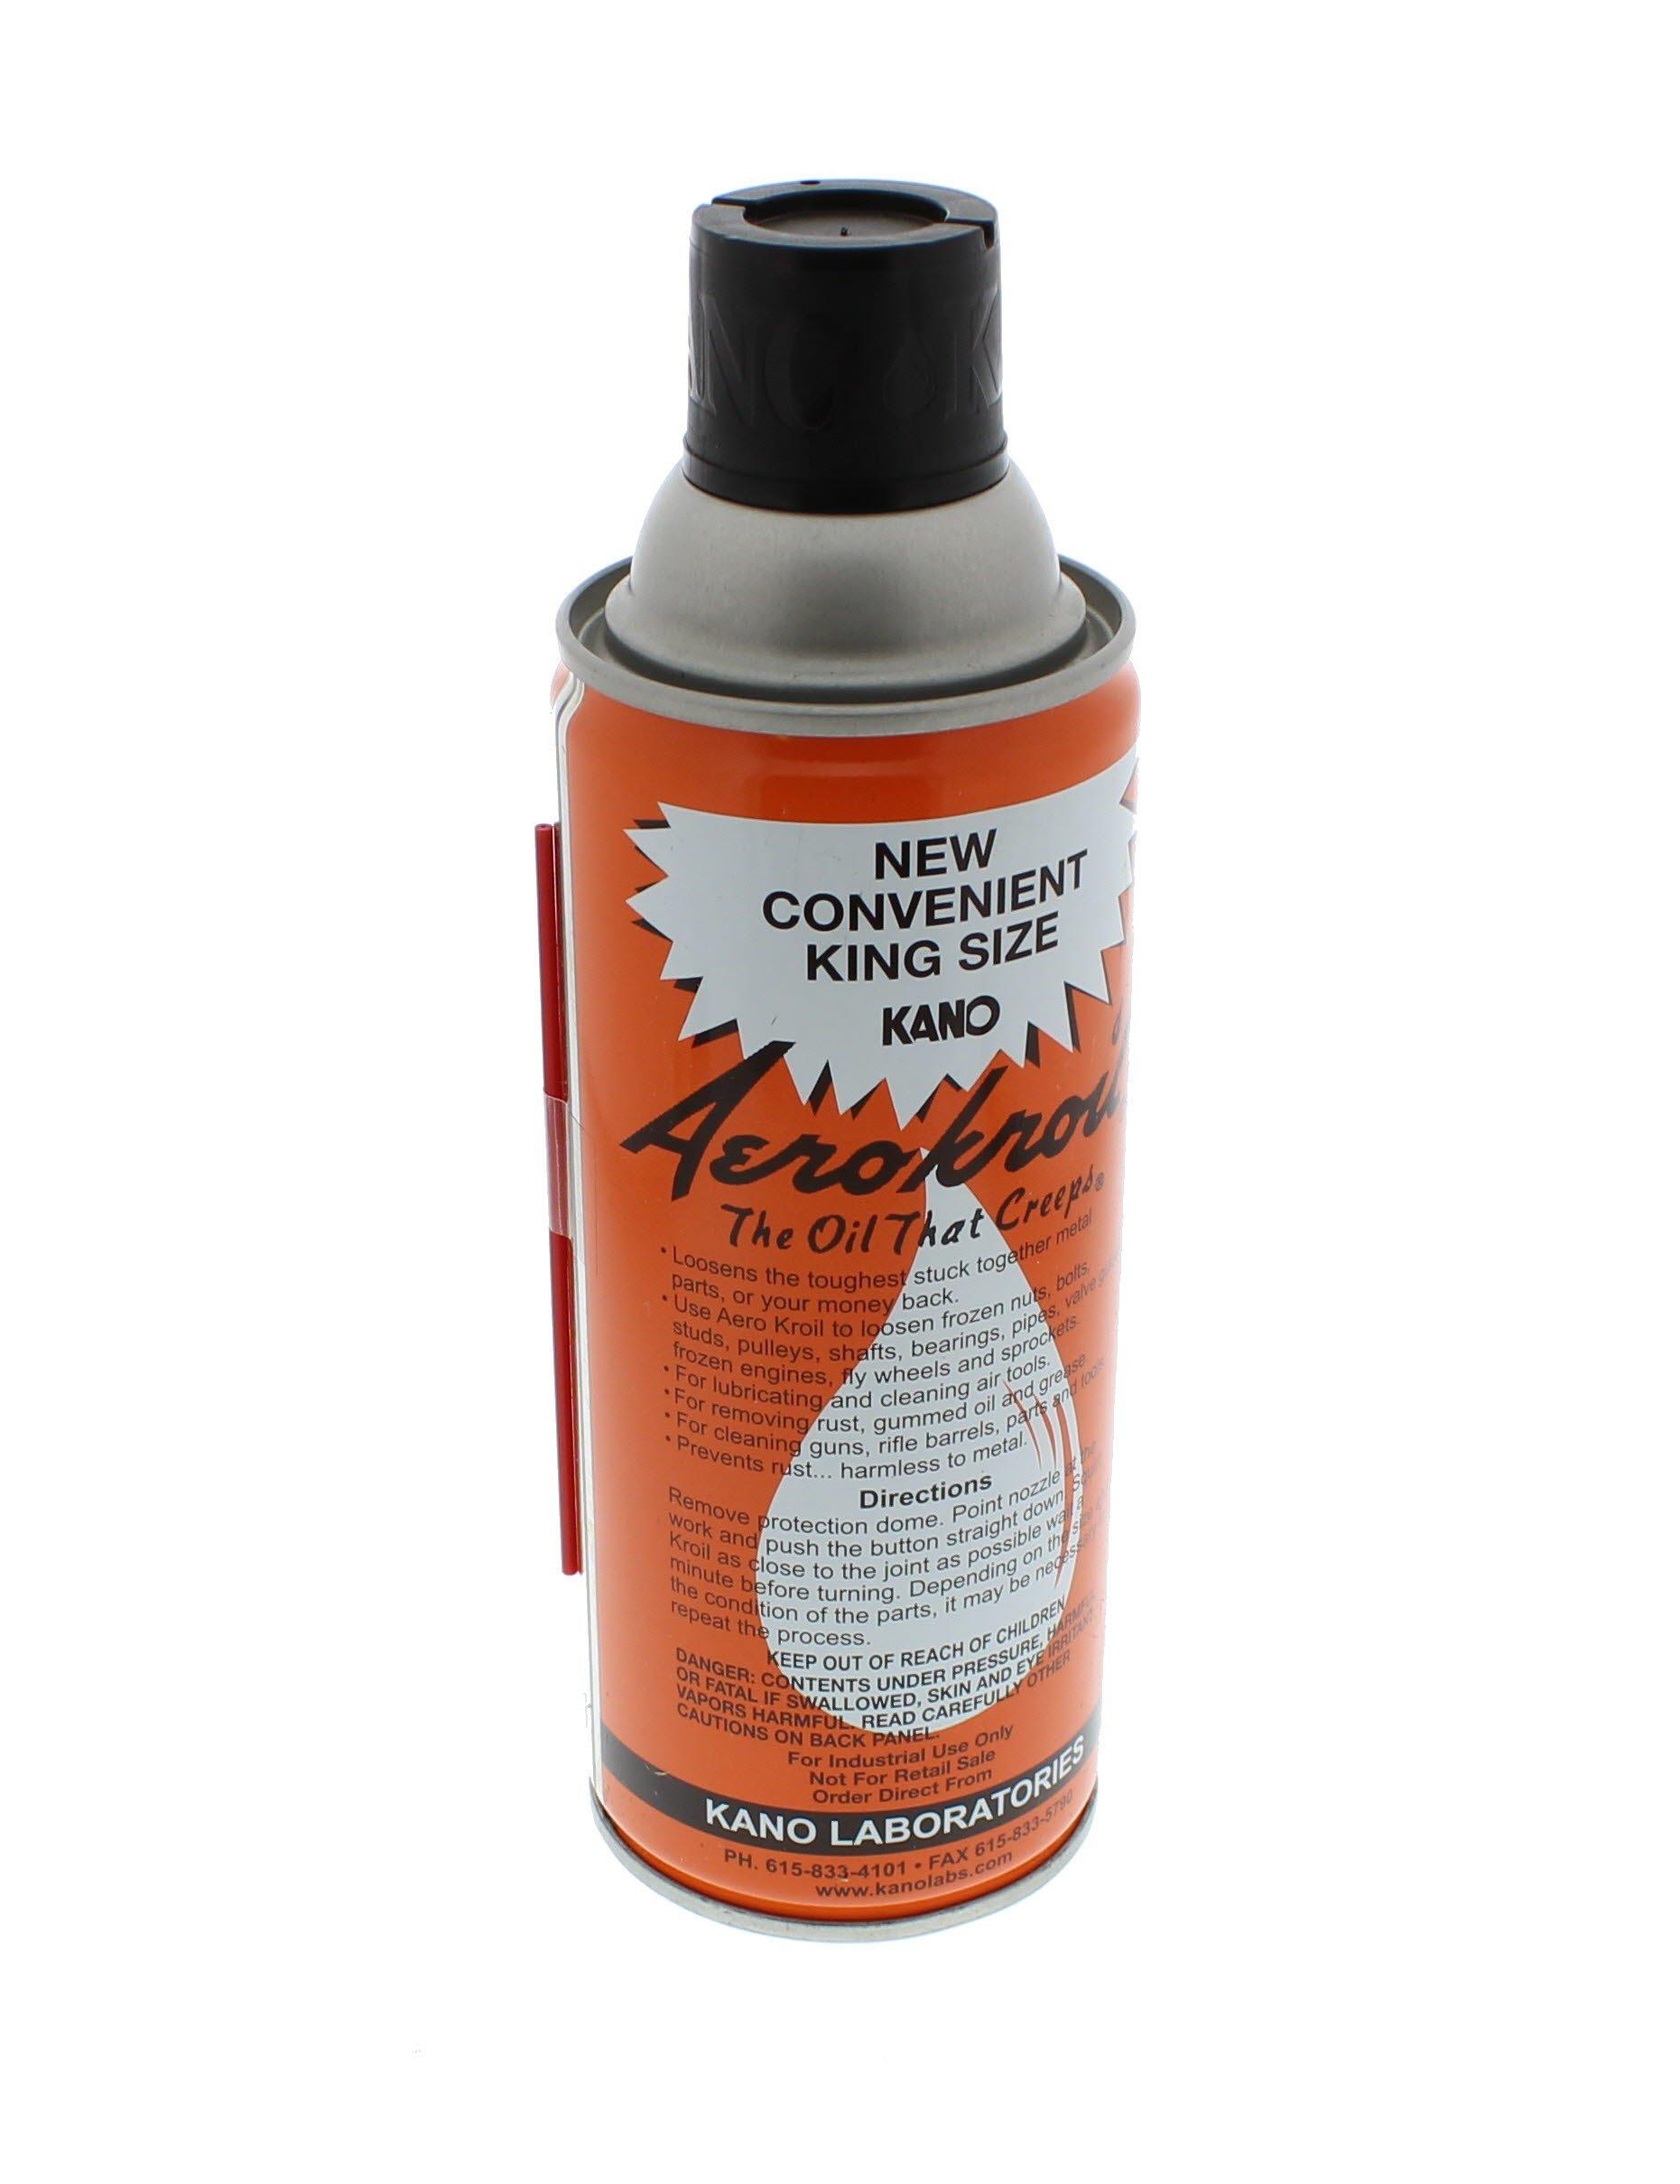 Kano Aerokroil Penetrating Oil, King Size, 13 oz. aerosol (AEROKRO0ILKING)